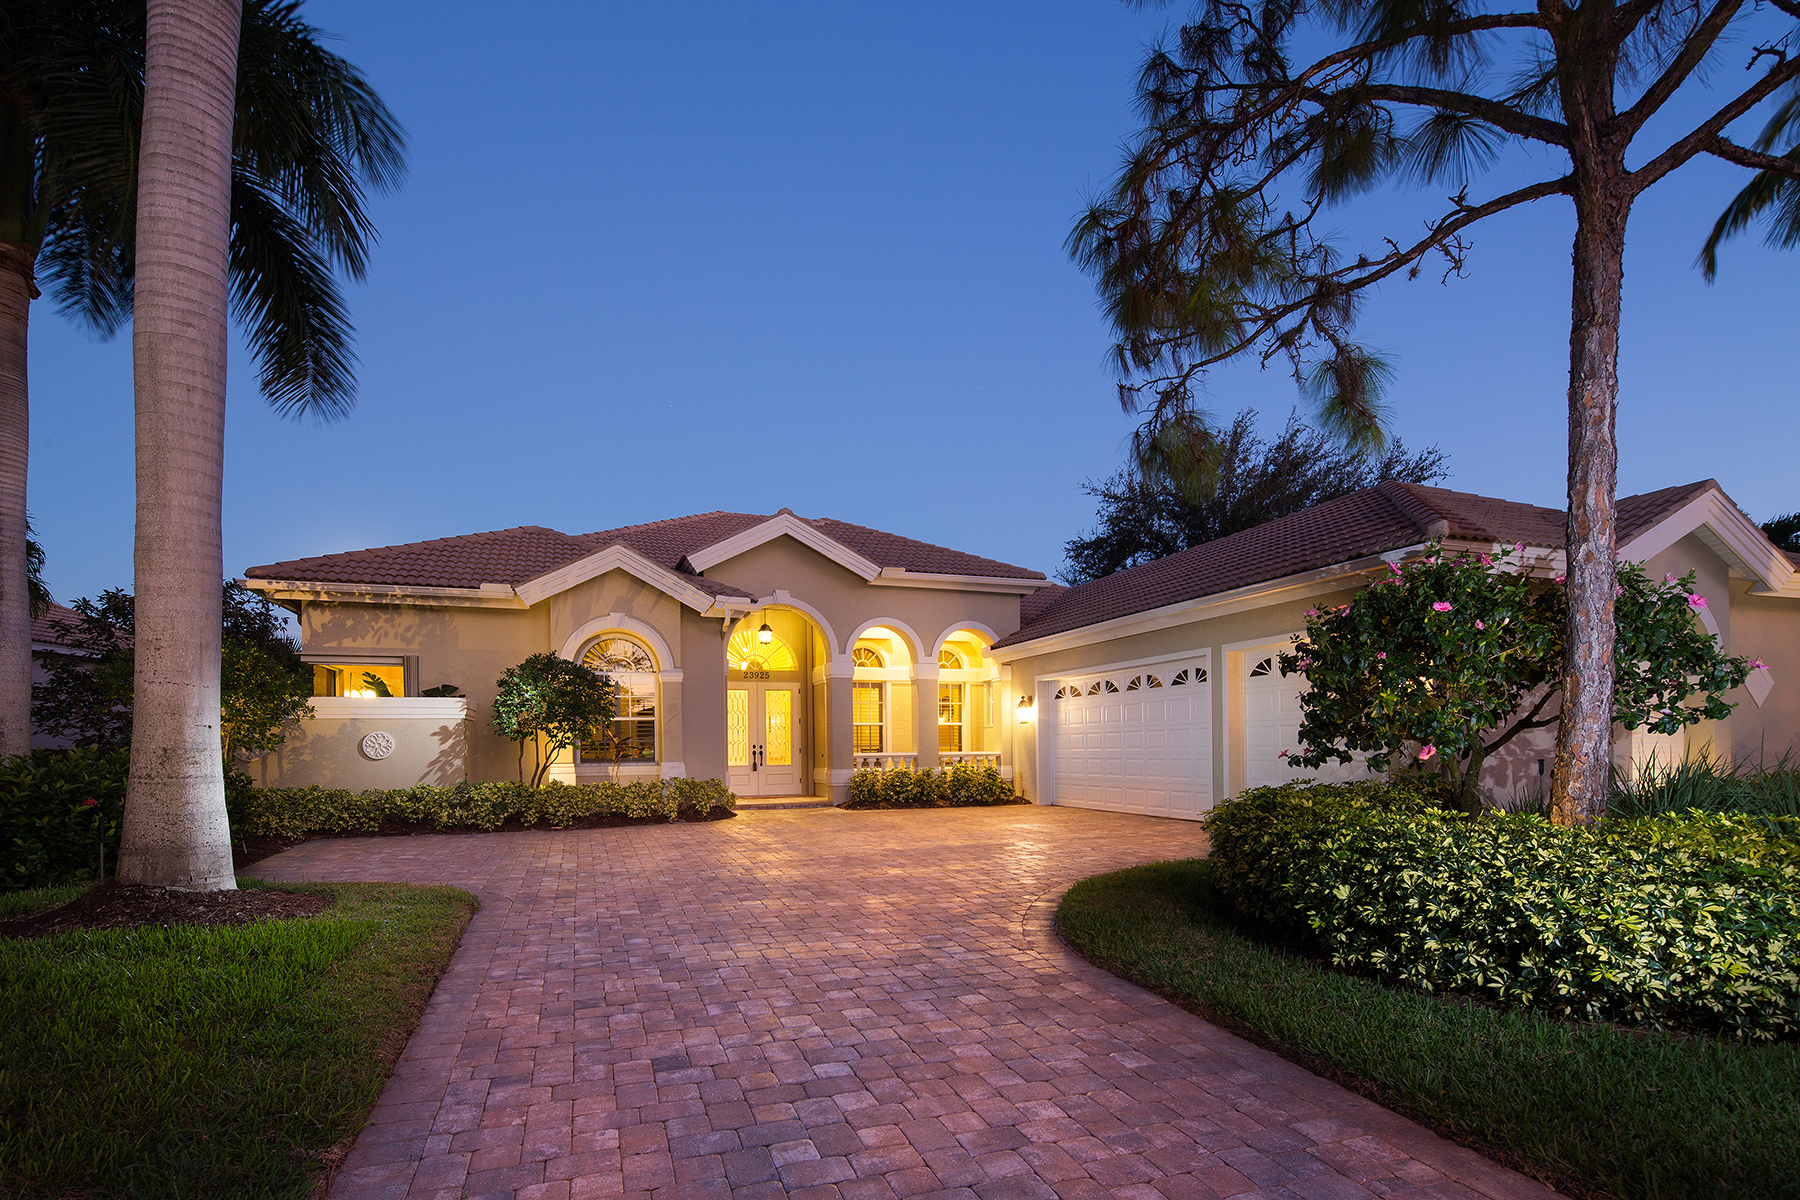 Einfamilienhaus für Verkauf beim PELICAN LANDING - SANCTUARY 23925 Sanctuary Lakes Ct Bonita Springs, Florida, 34134 Vereinigte Staaten